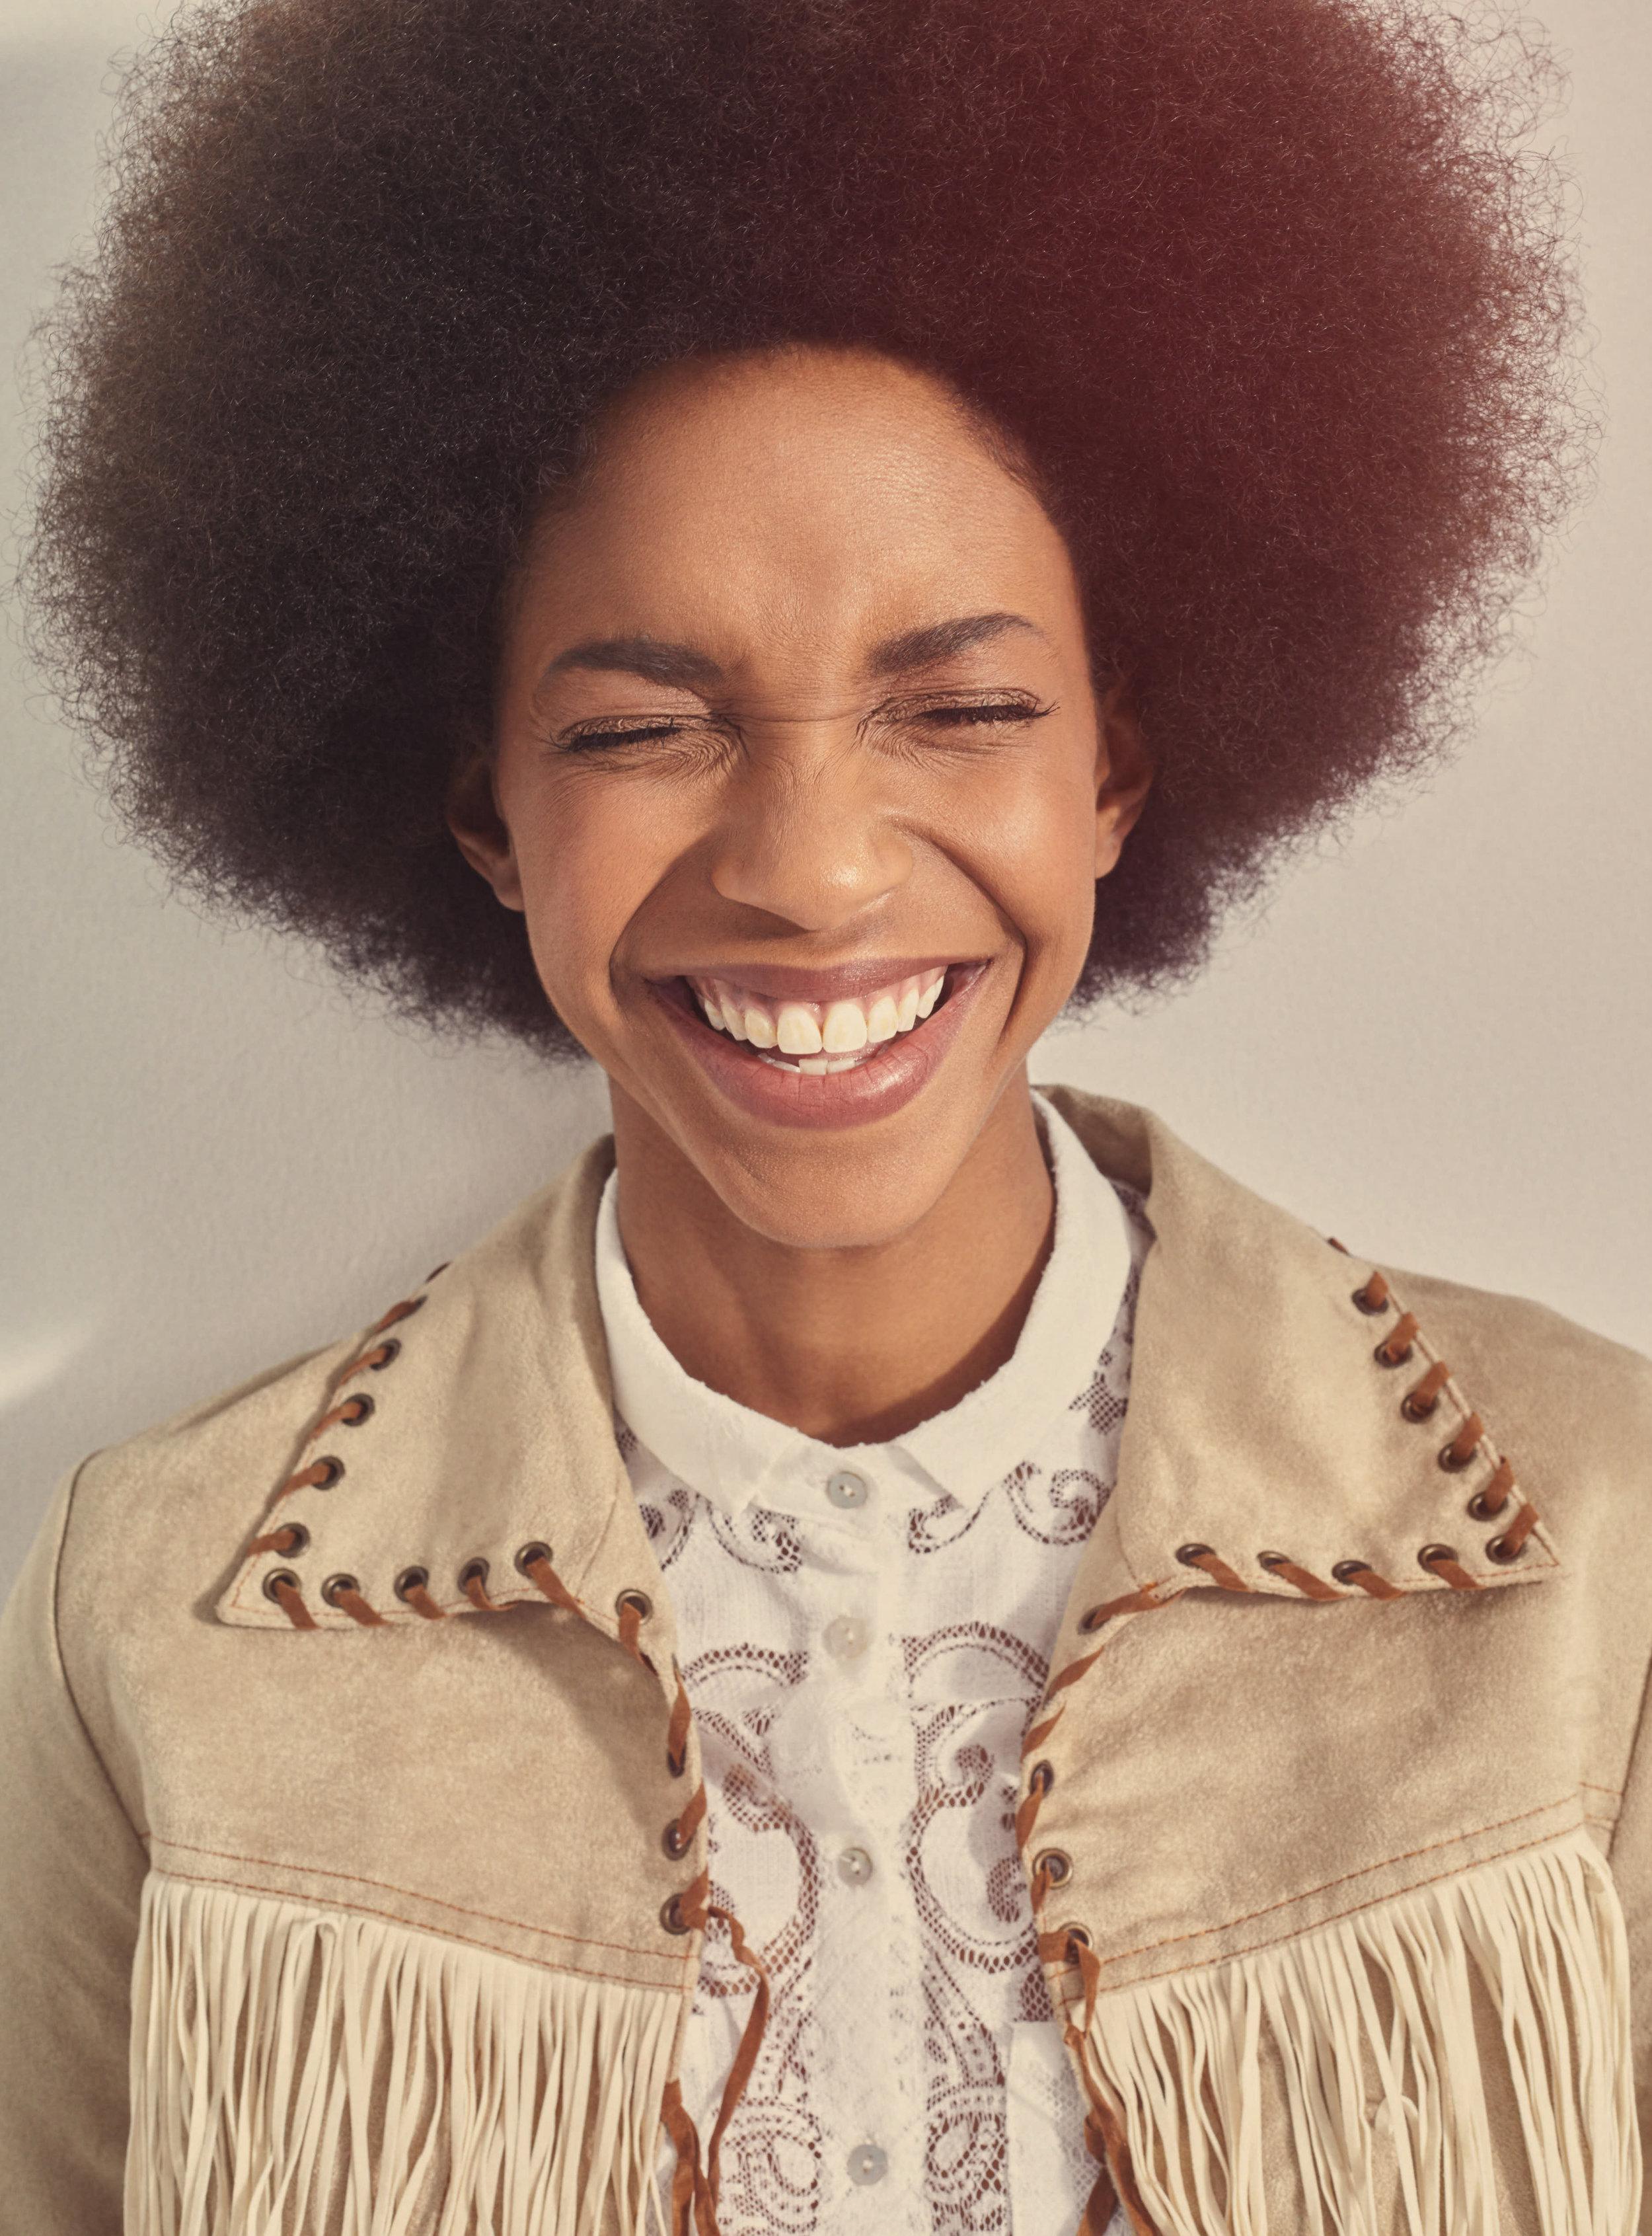 Retro-Afro-Girl-Smiling